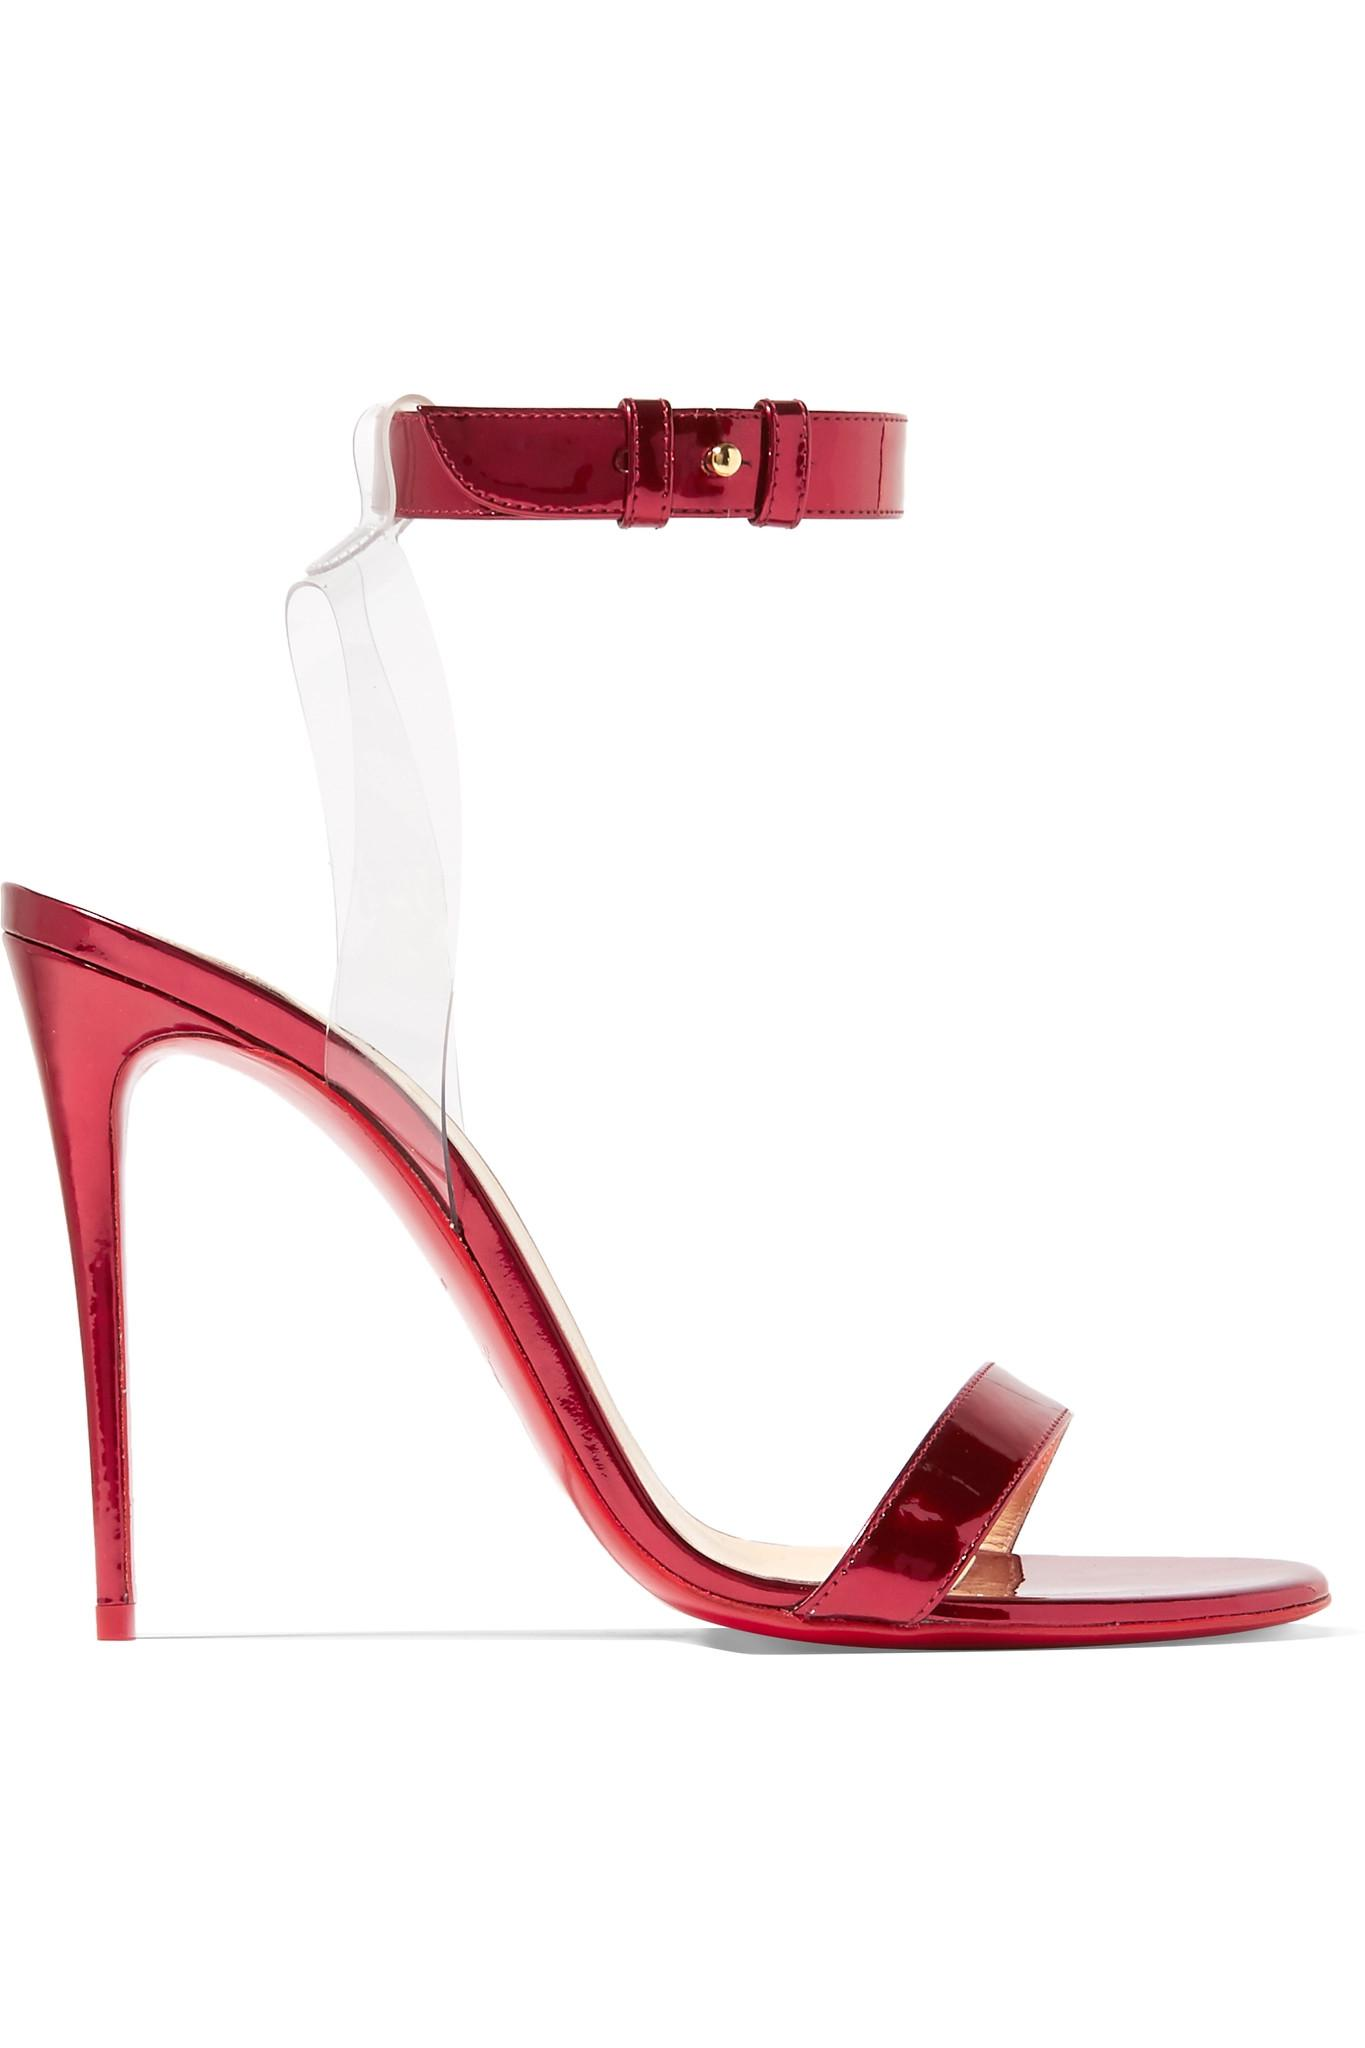 f7ecce5a353 Christian Louboutin. Women s Jonatina 100 Pvc-trimmed Mirrored-leather  Sandals ...